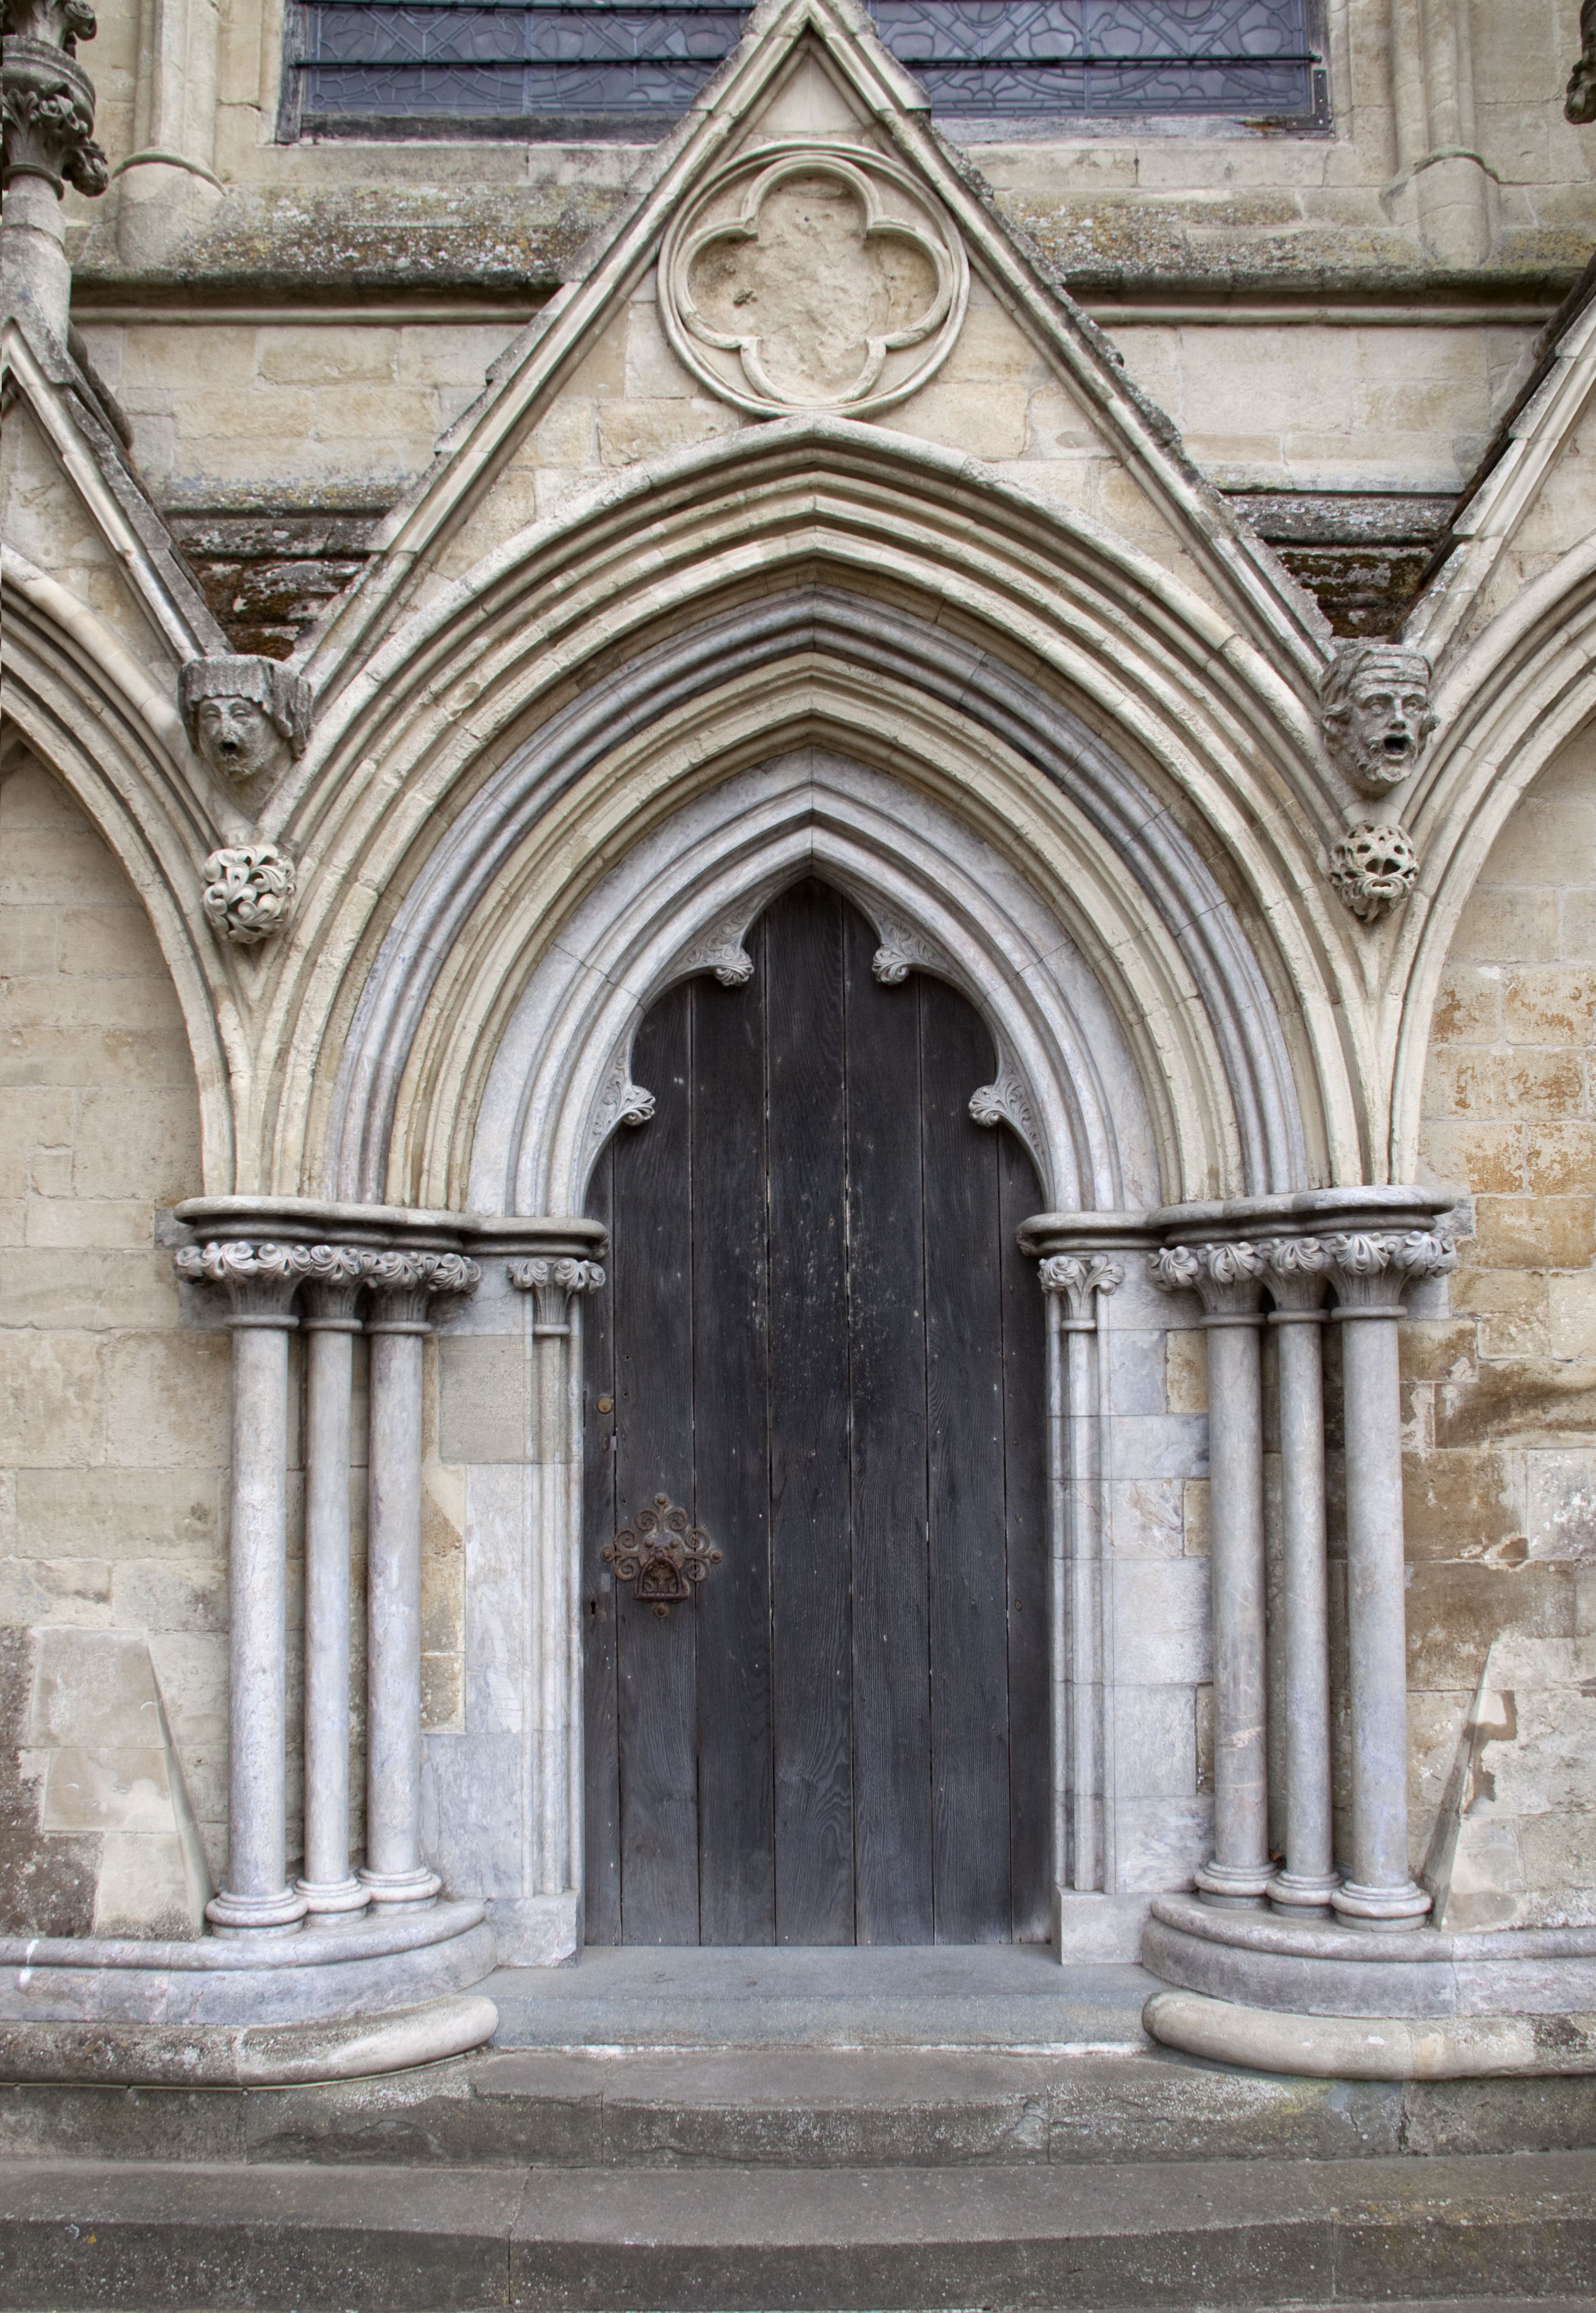 Cathedral Doors & Cathedral Doors | Doors | Pinterest | Cathedrals and Doors